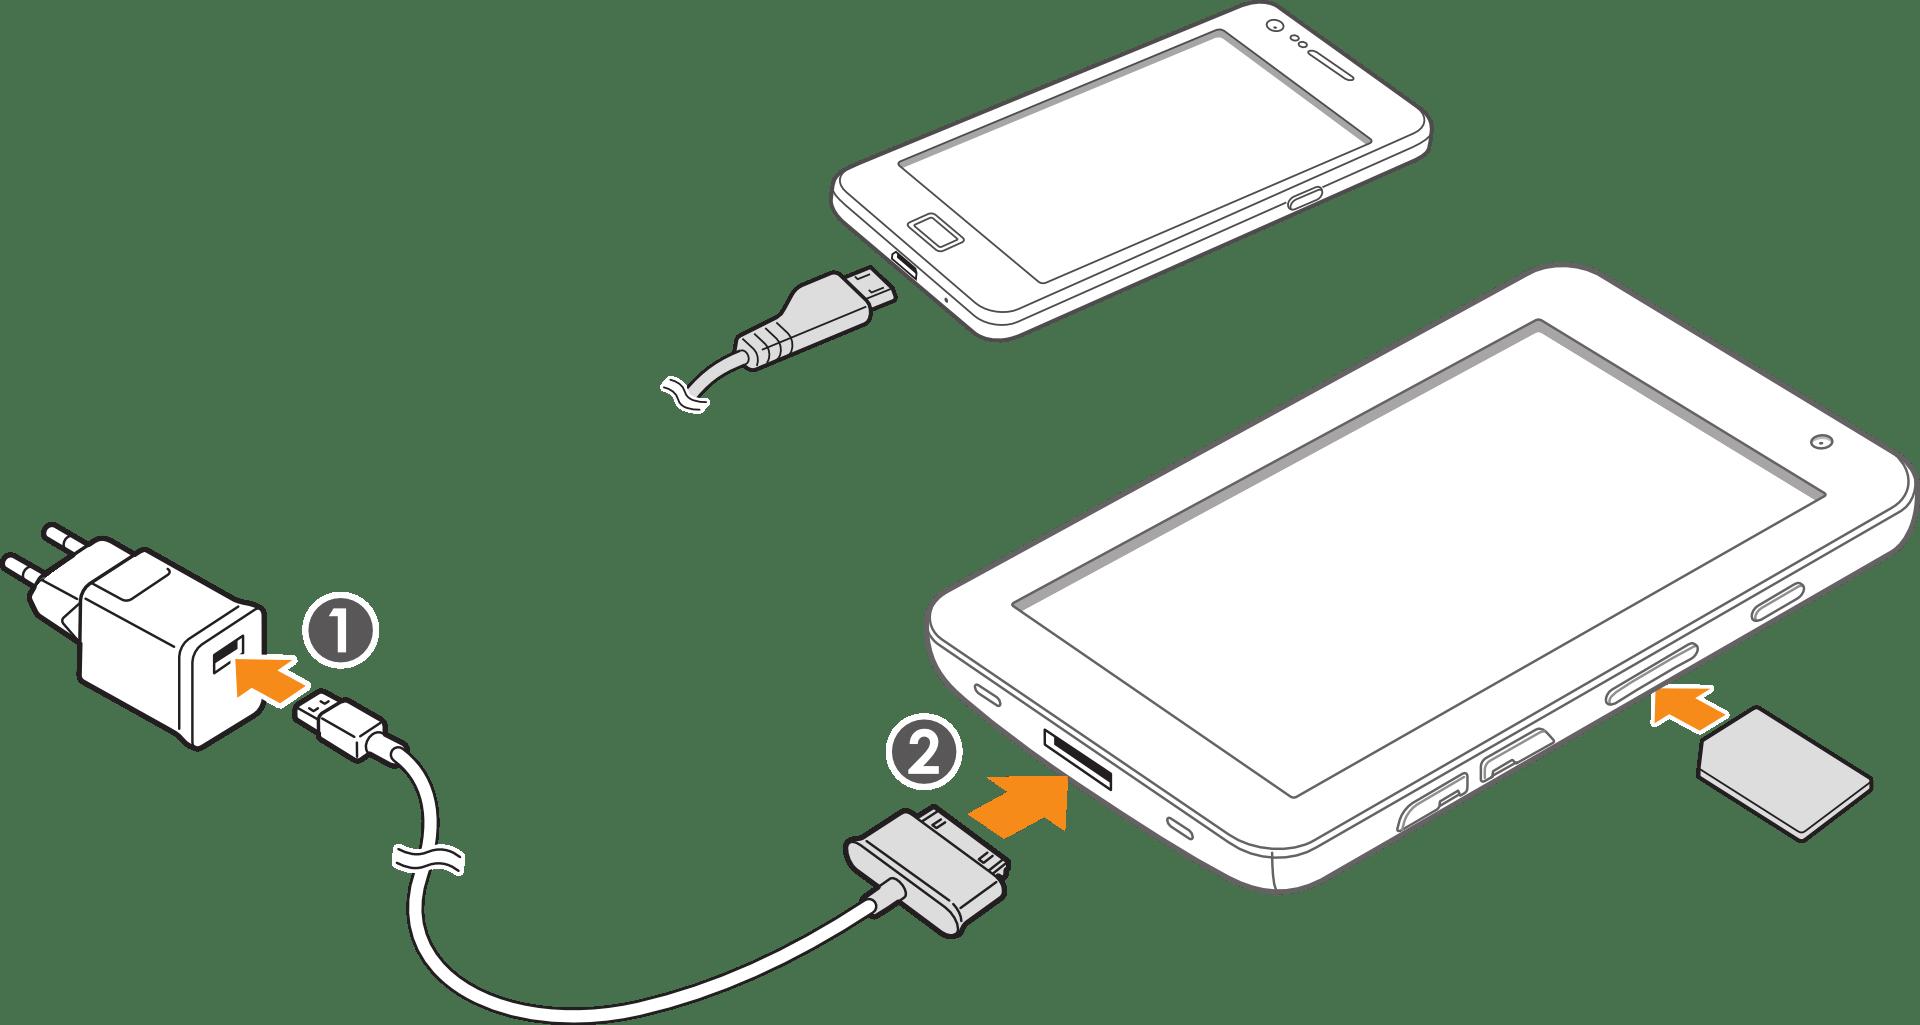 #Edutechdebate: Tablets vs. Smart Phones in Education